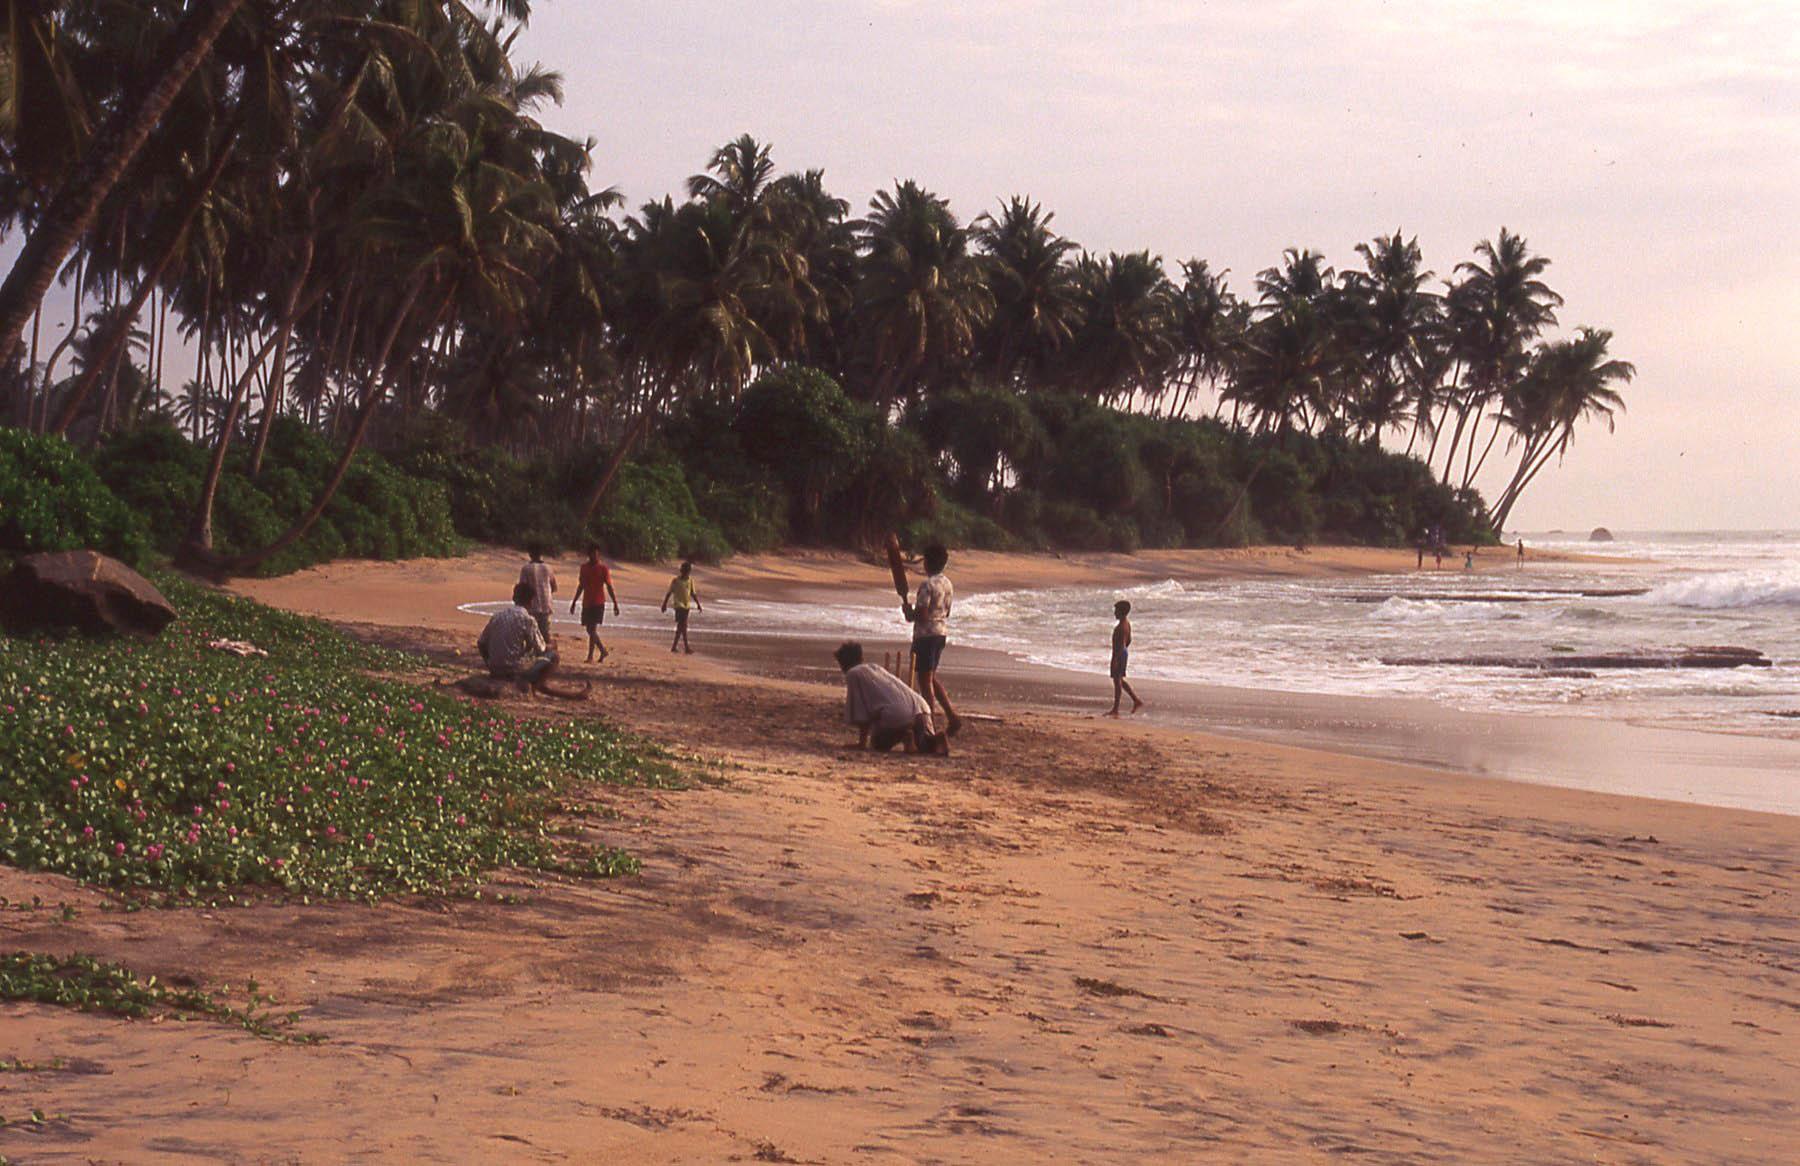 Sri Lanka Beach Cricket scene © JonoVernon-Powell